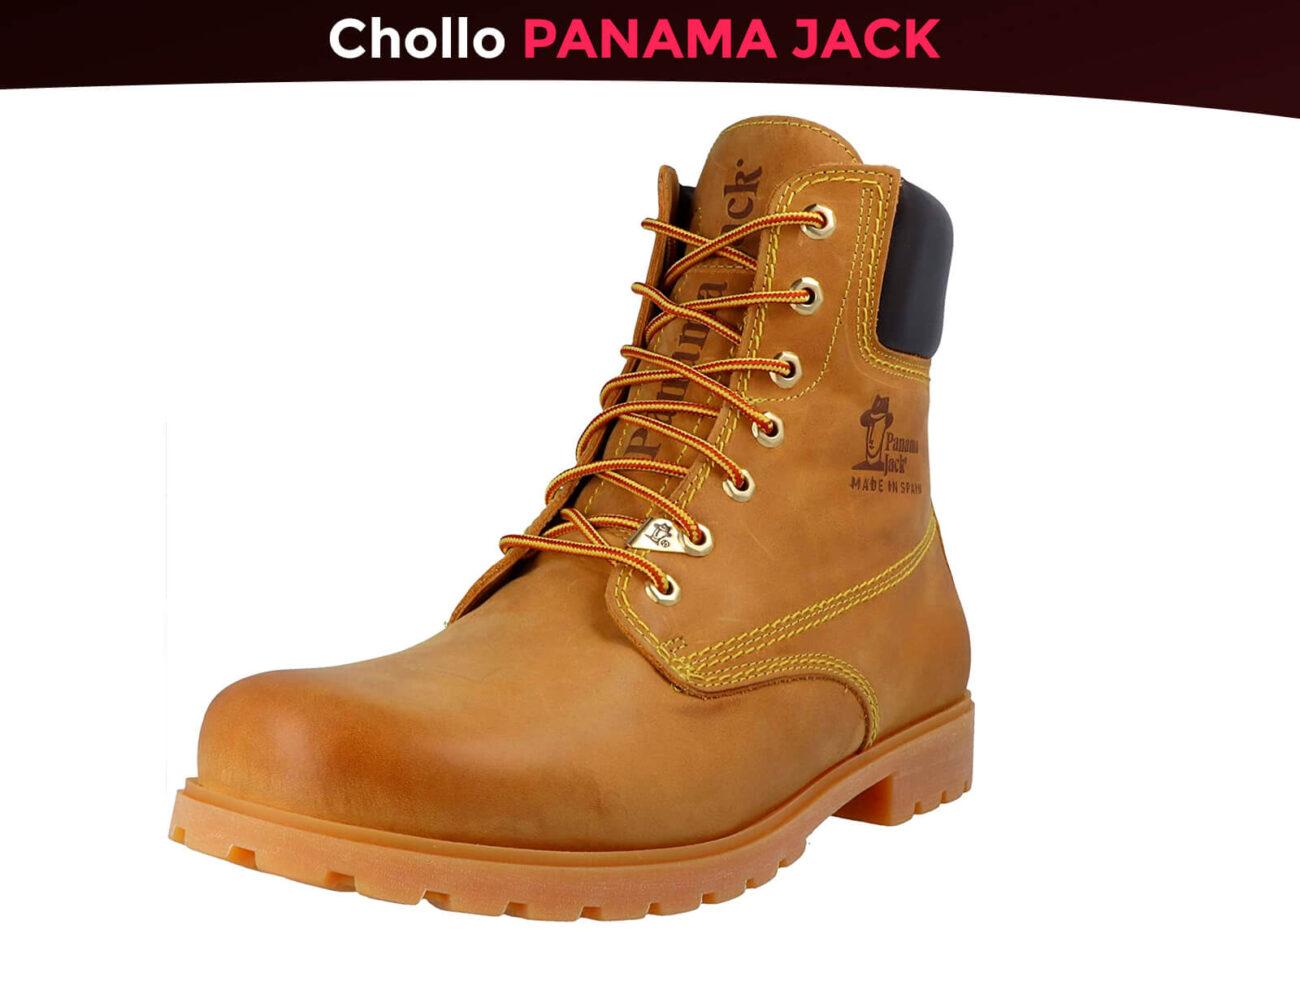 Botas Panama Jack en oferta